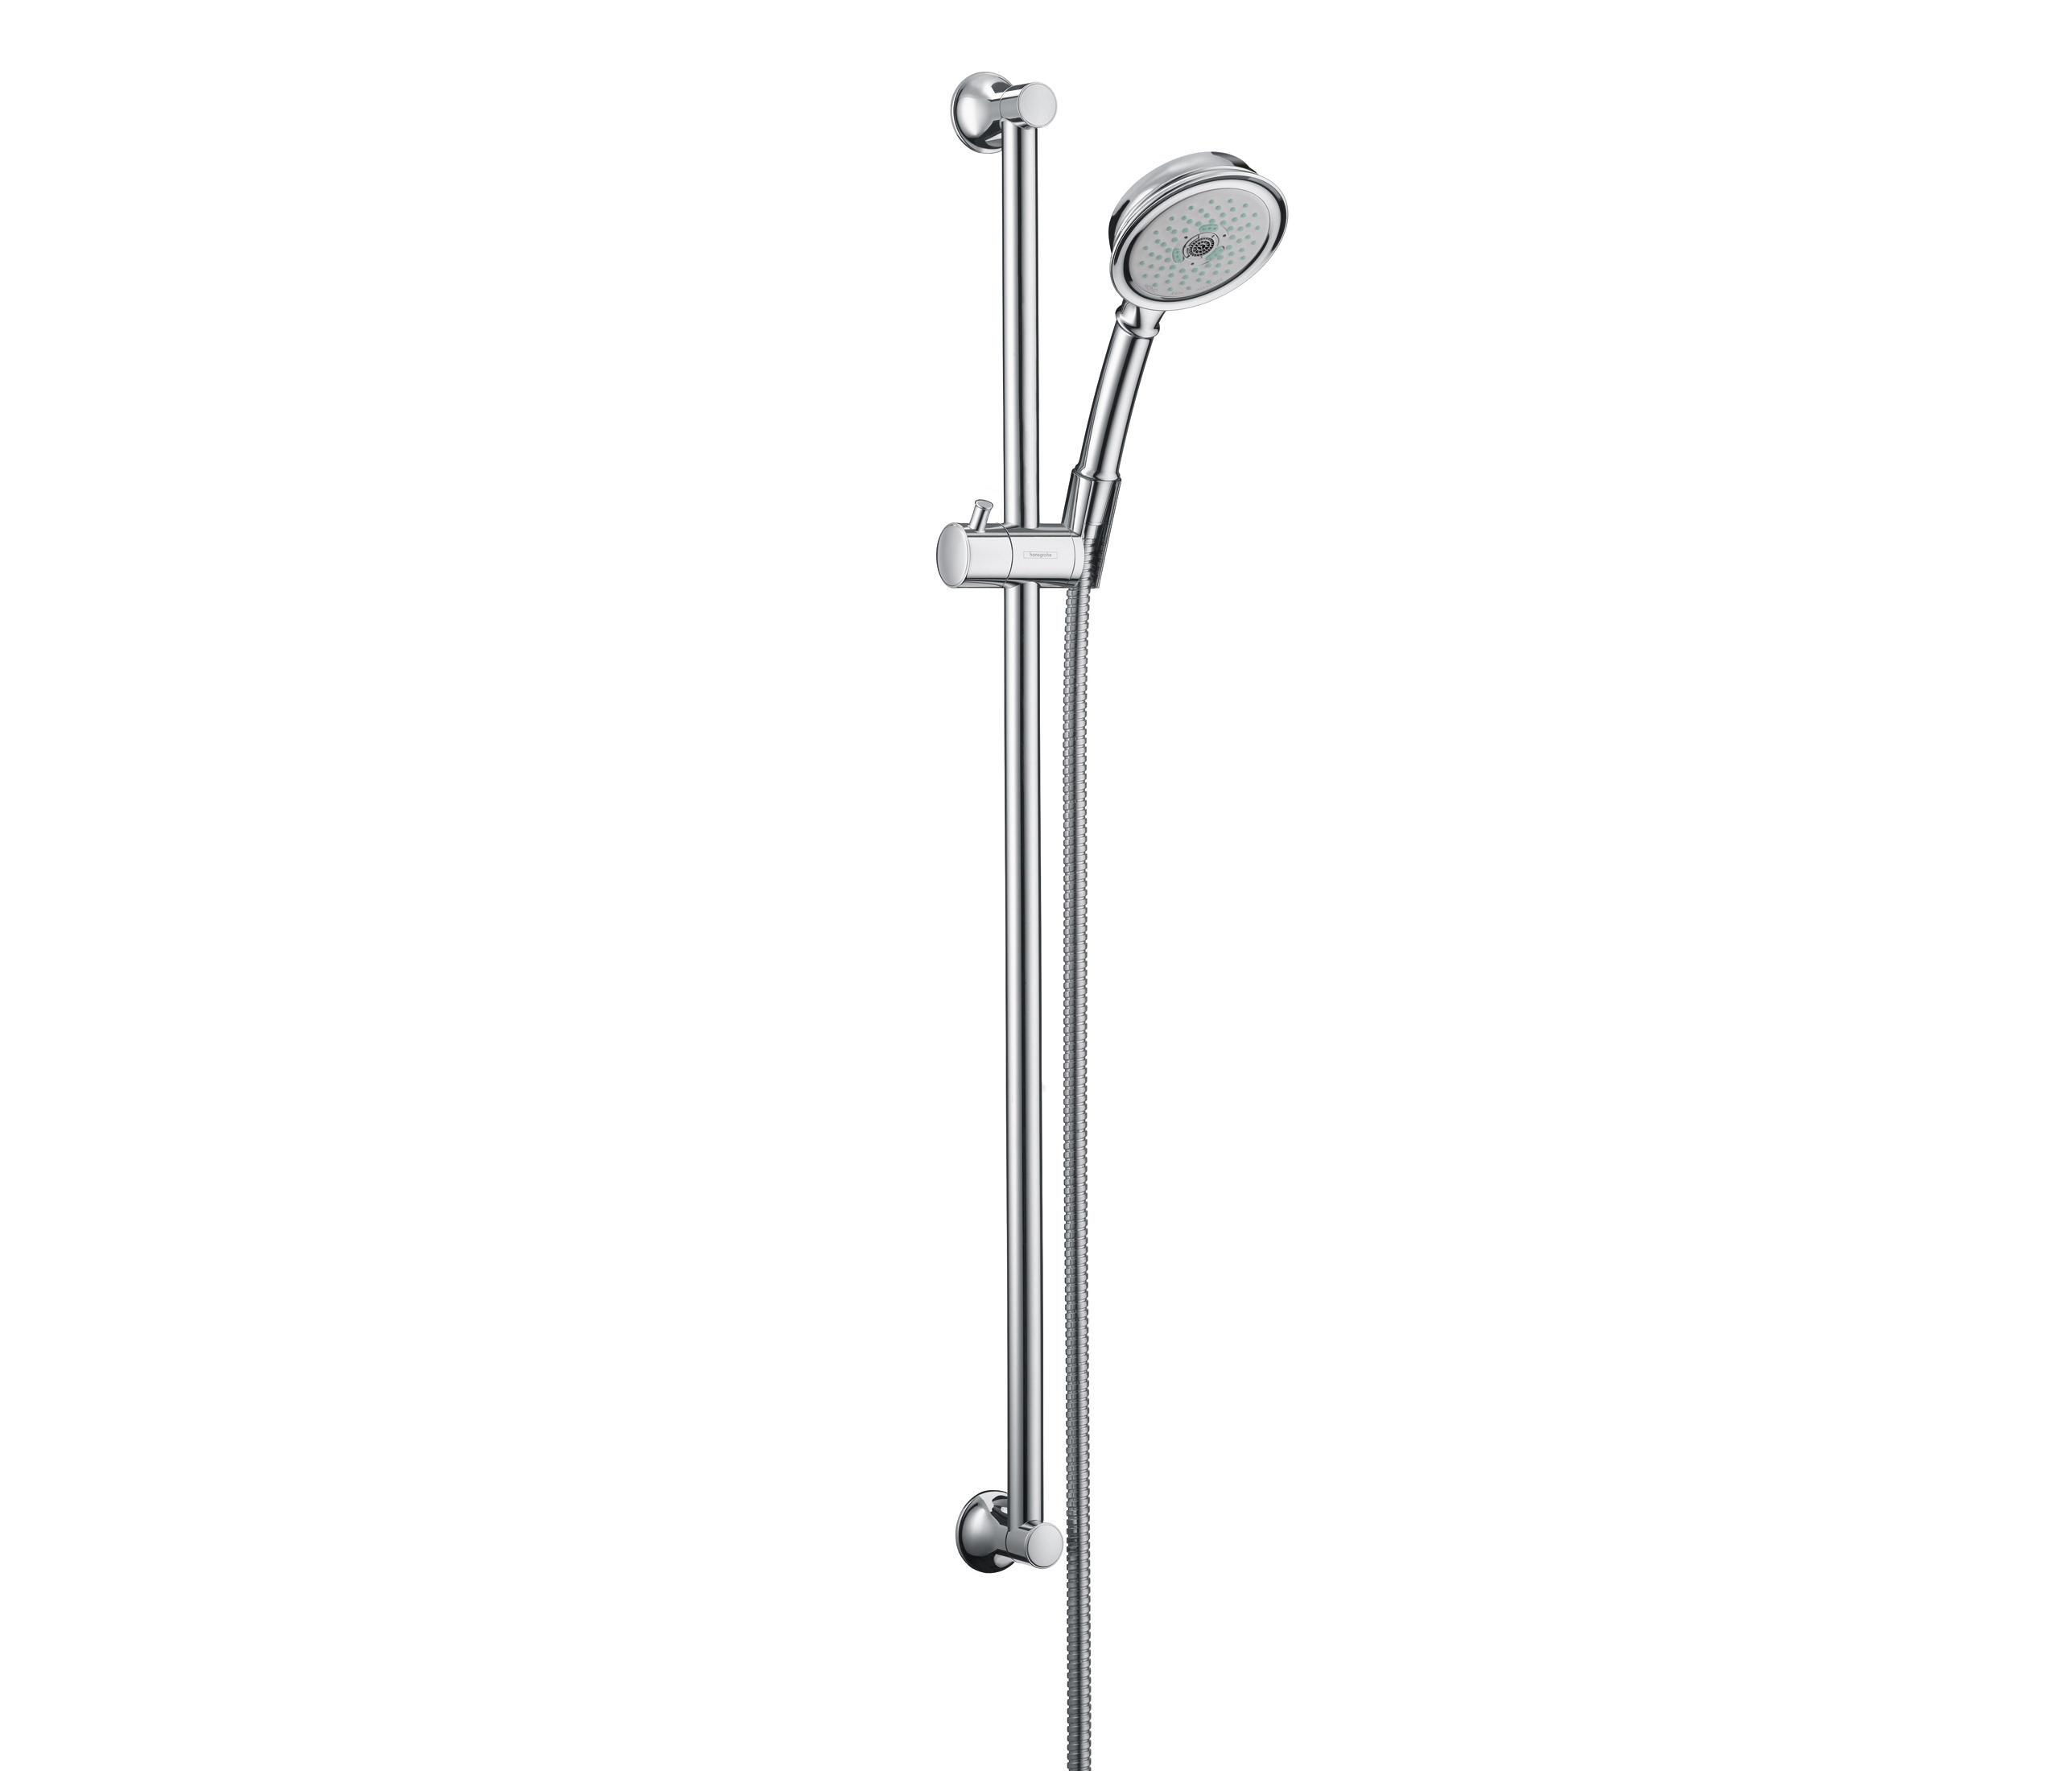 hansgrohe talis classic croma 100 classic multi unica 39 classic set shower taps mixers. Black Bedroom Furniture Sets. Home Design Ideas